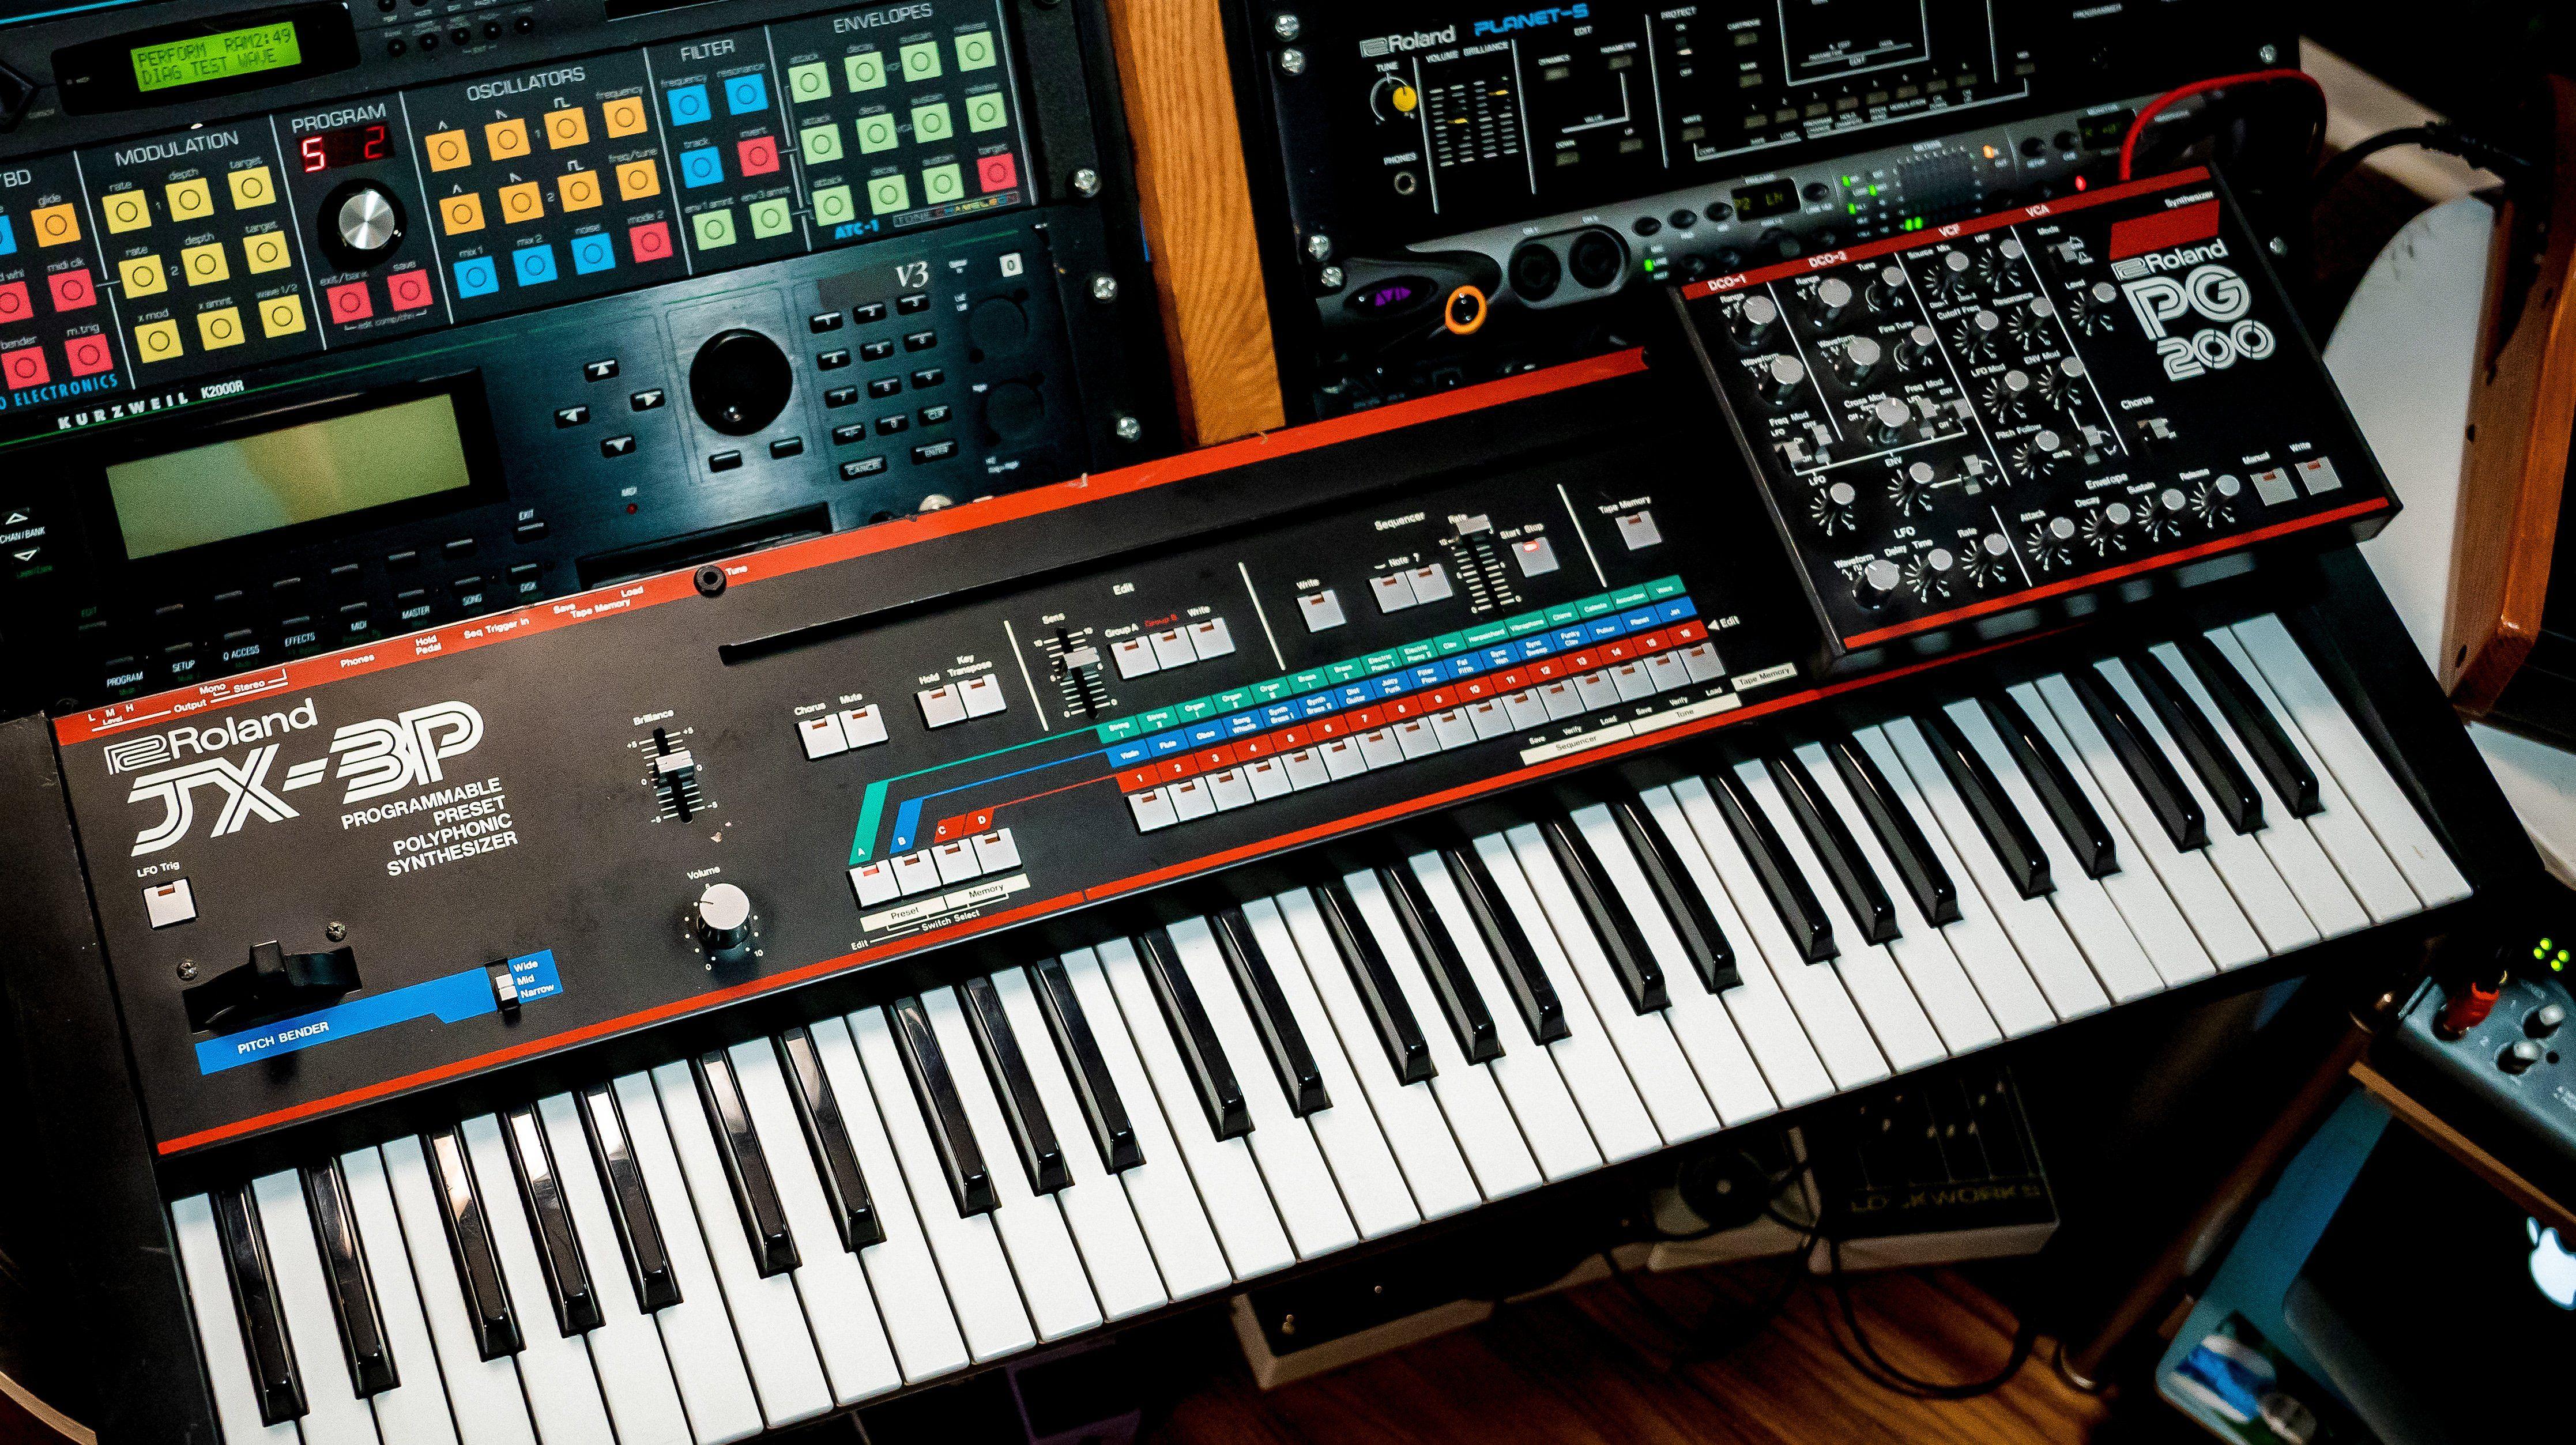 56.jpg Ableton, Singularity, Studio gear